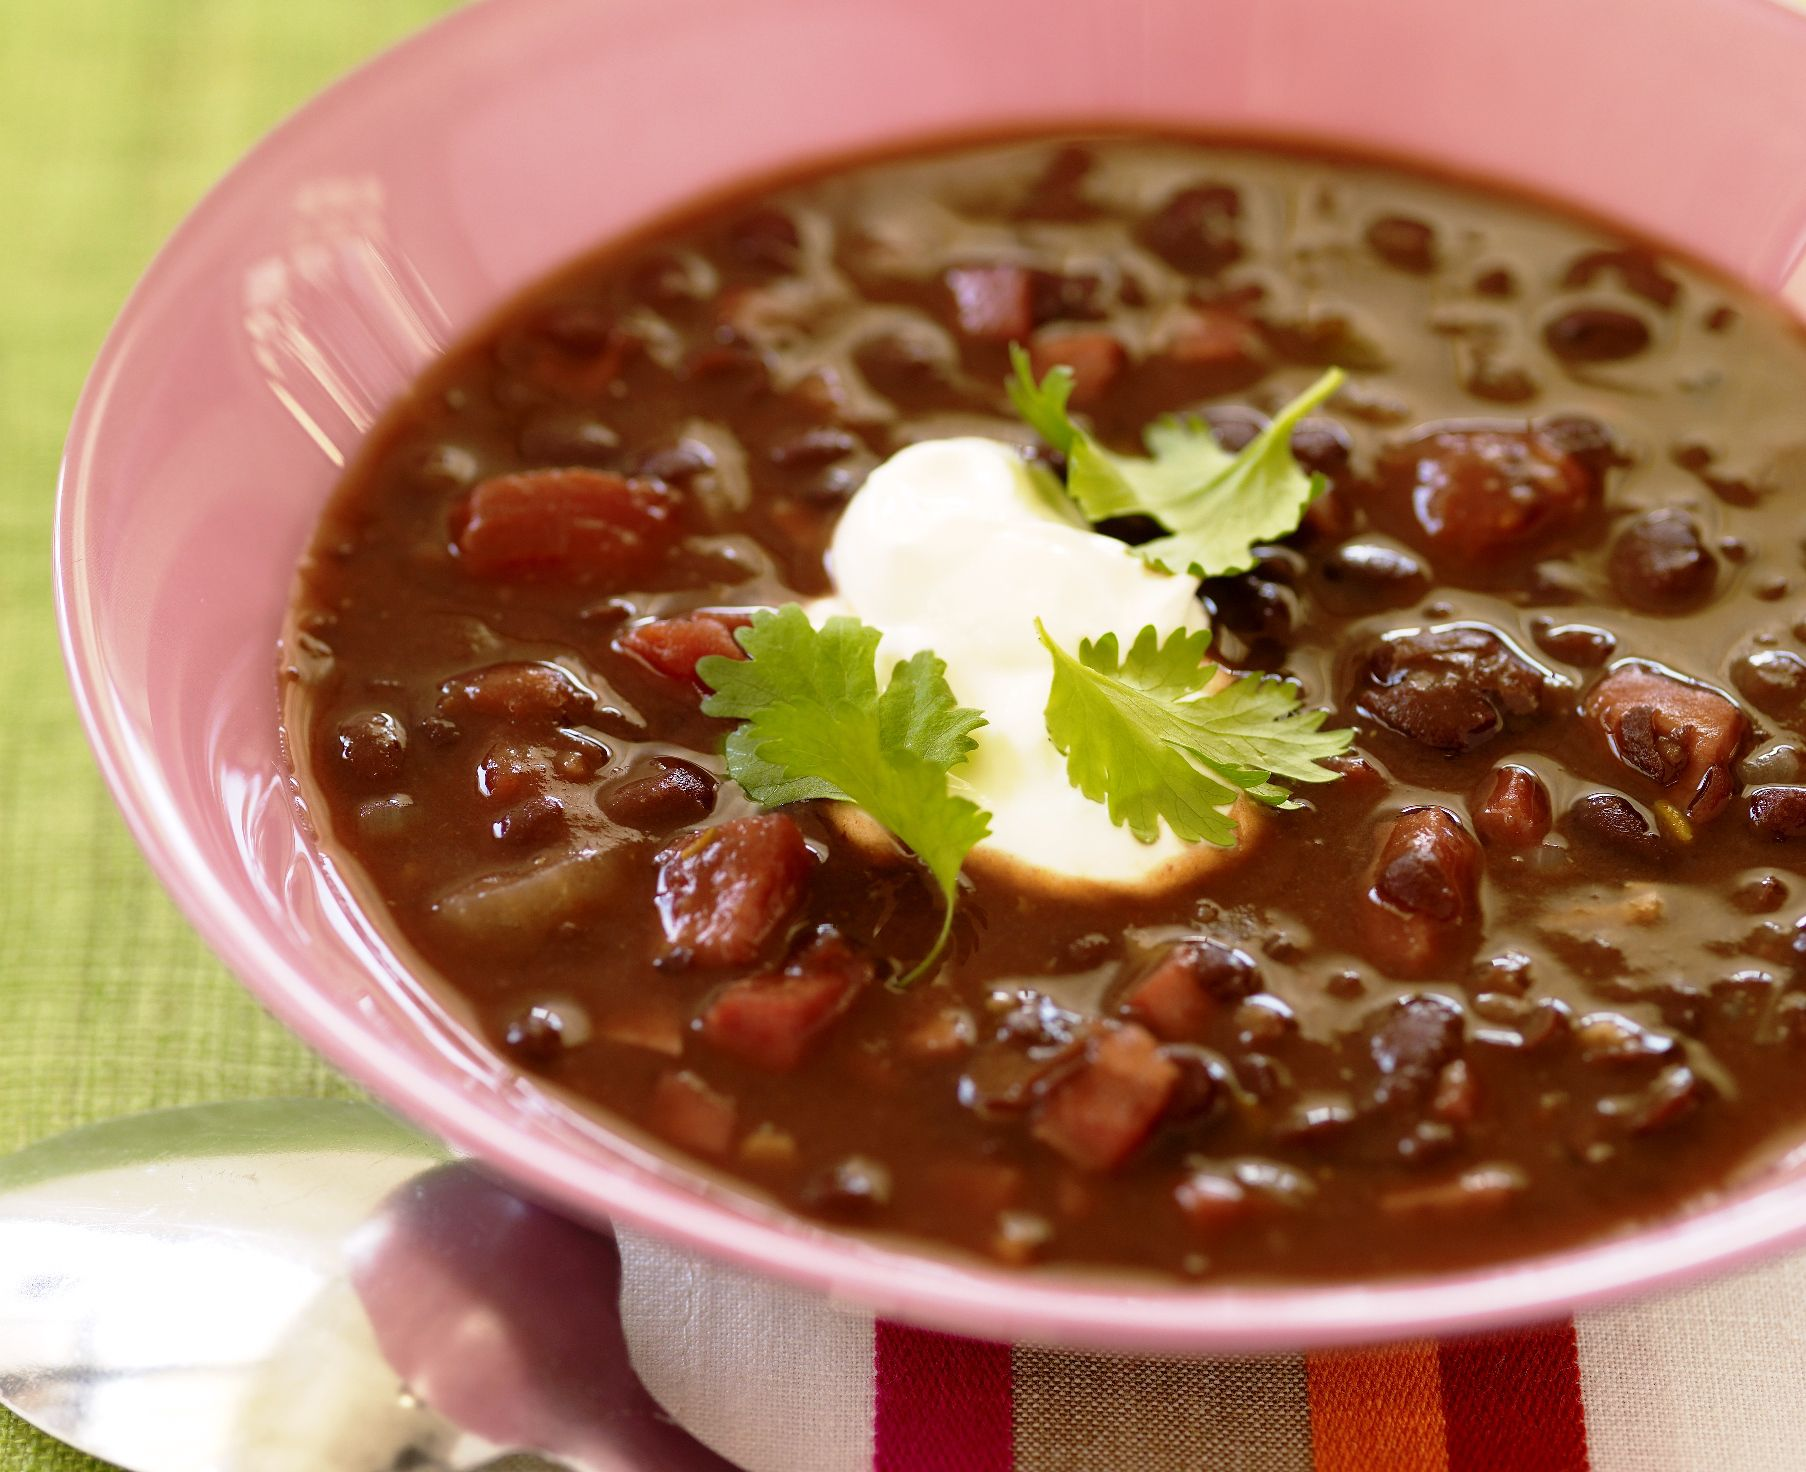 Most Popular Vegetarian And Vegan Soup Recipes